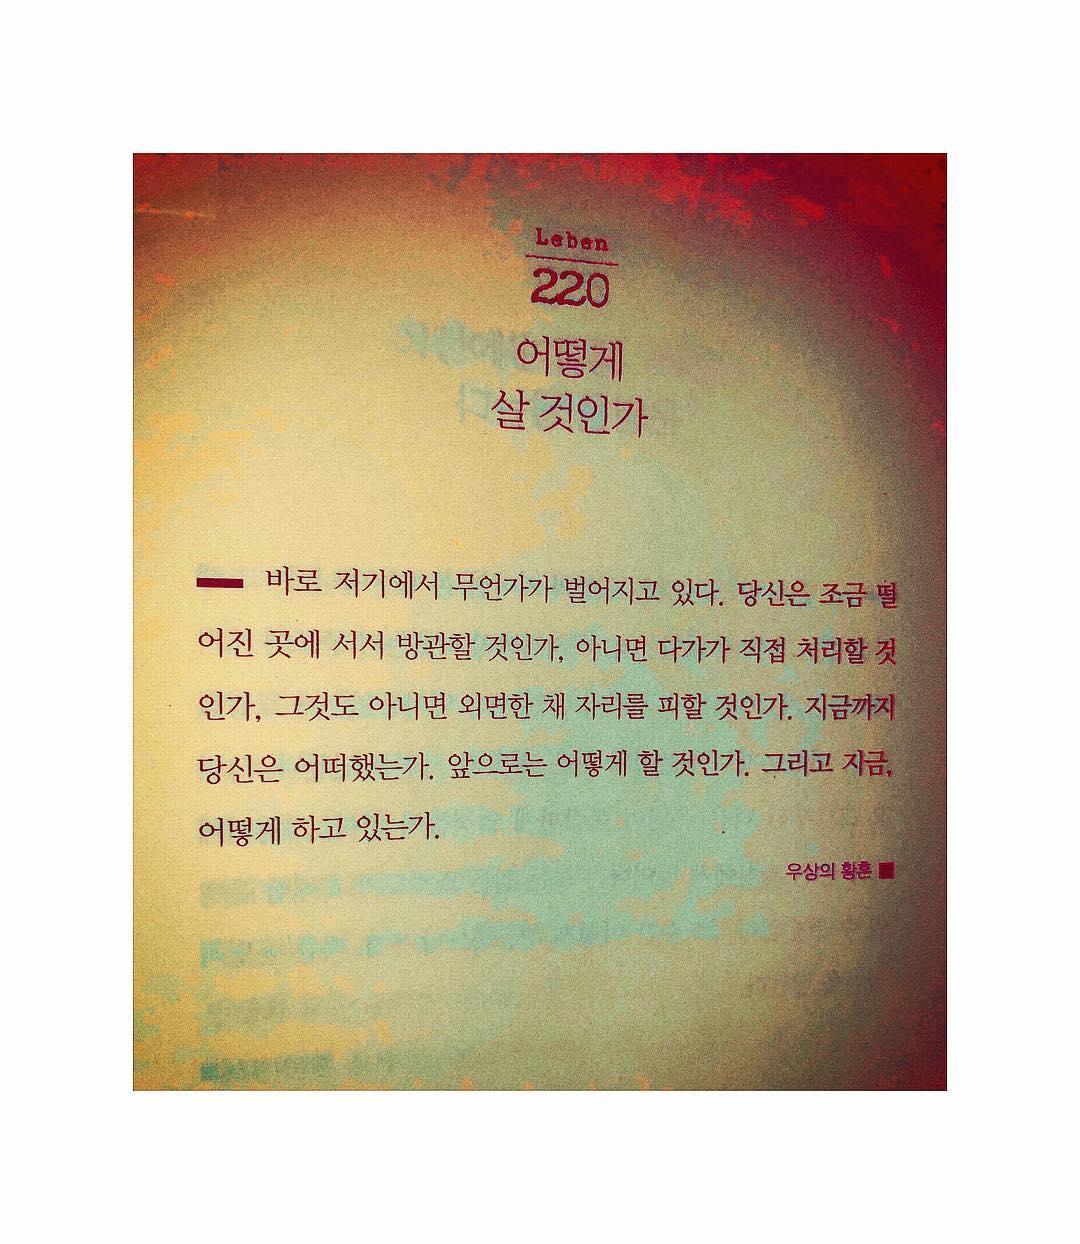 g-dragon 2019 instagram 2